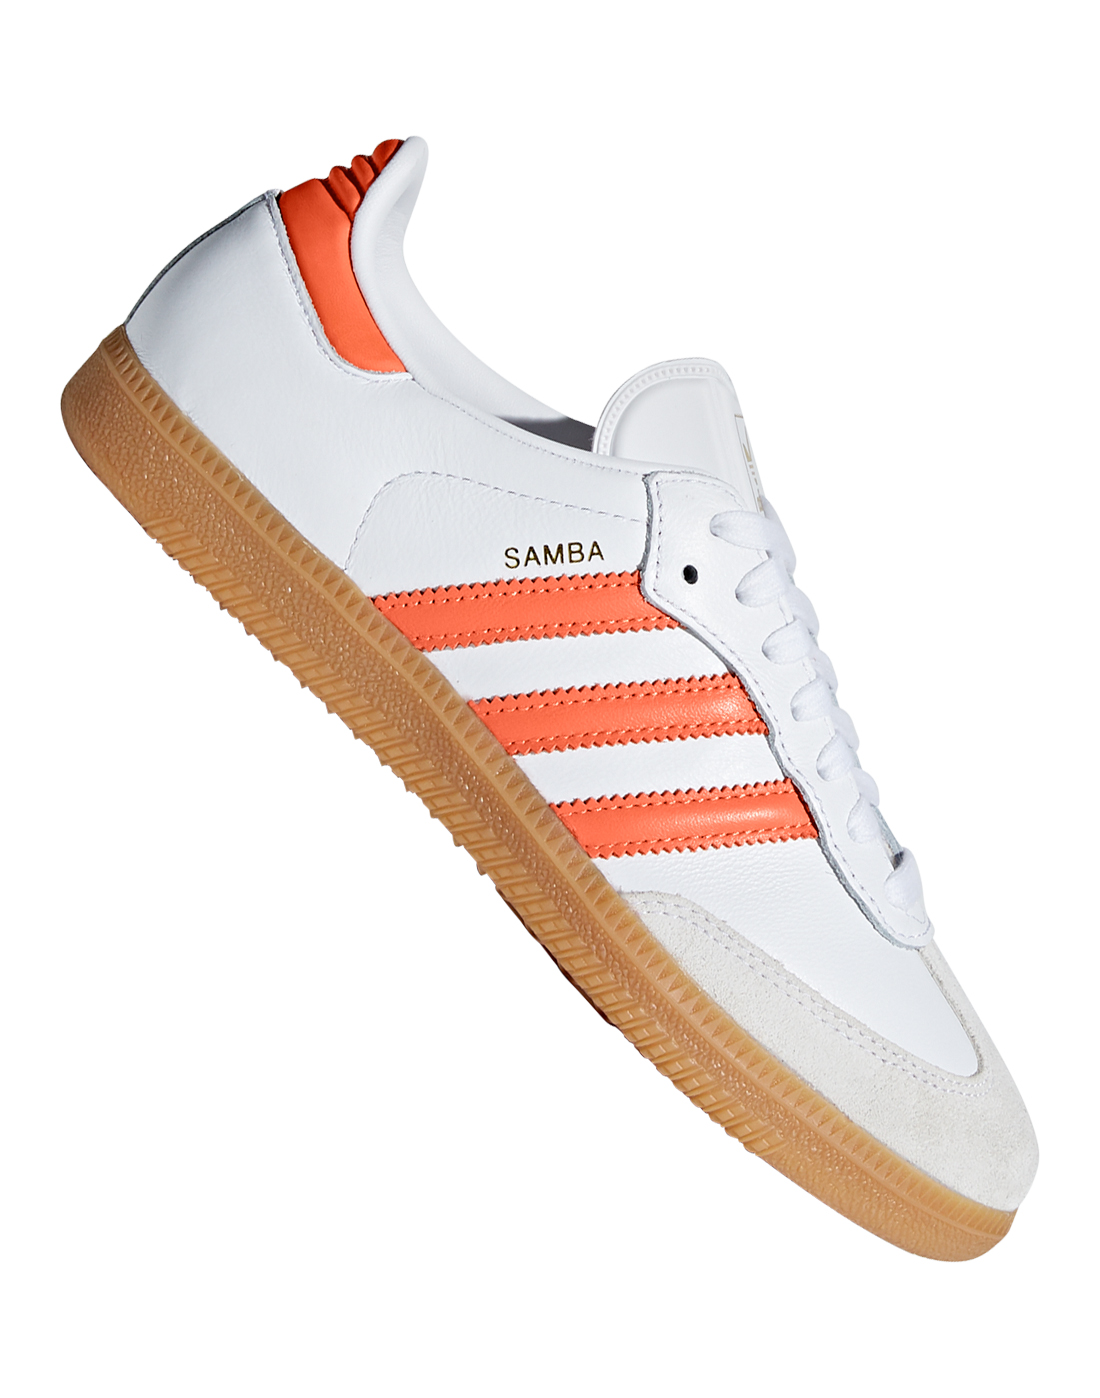 658deb2e08b9 adidas Originals. Womens Samba. Womens Samba ...